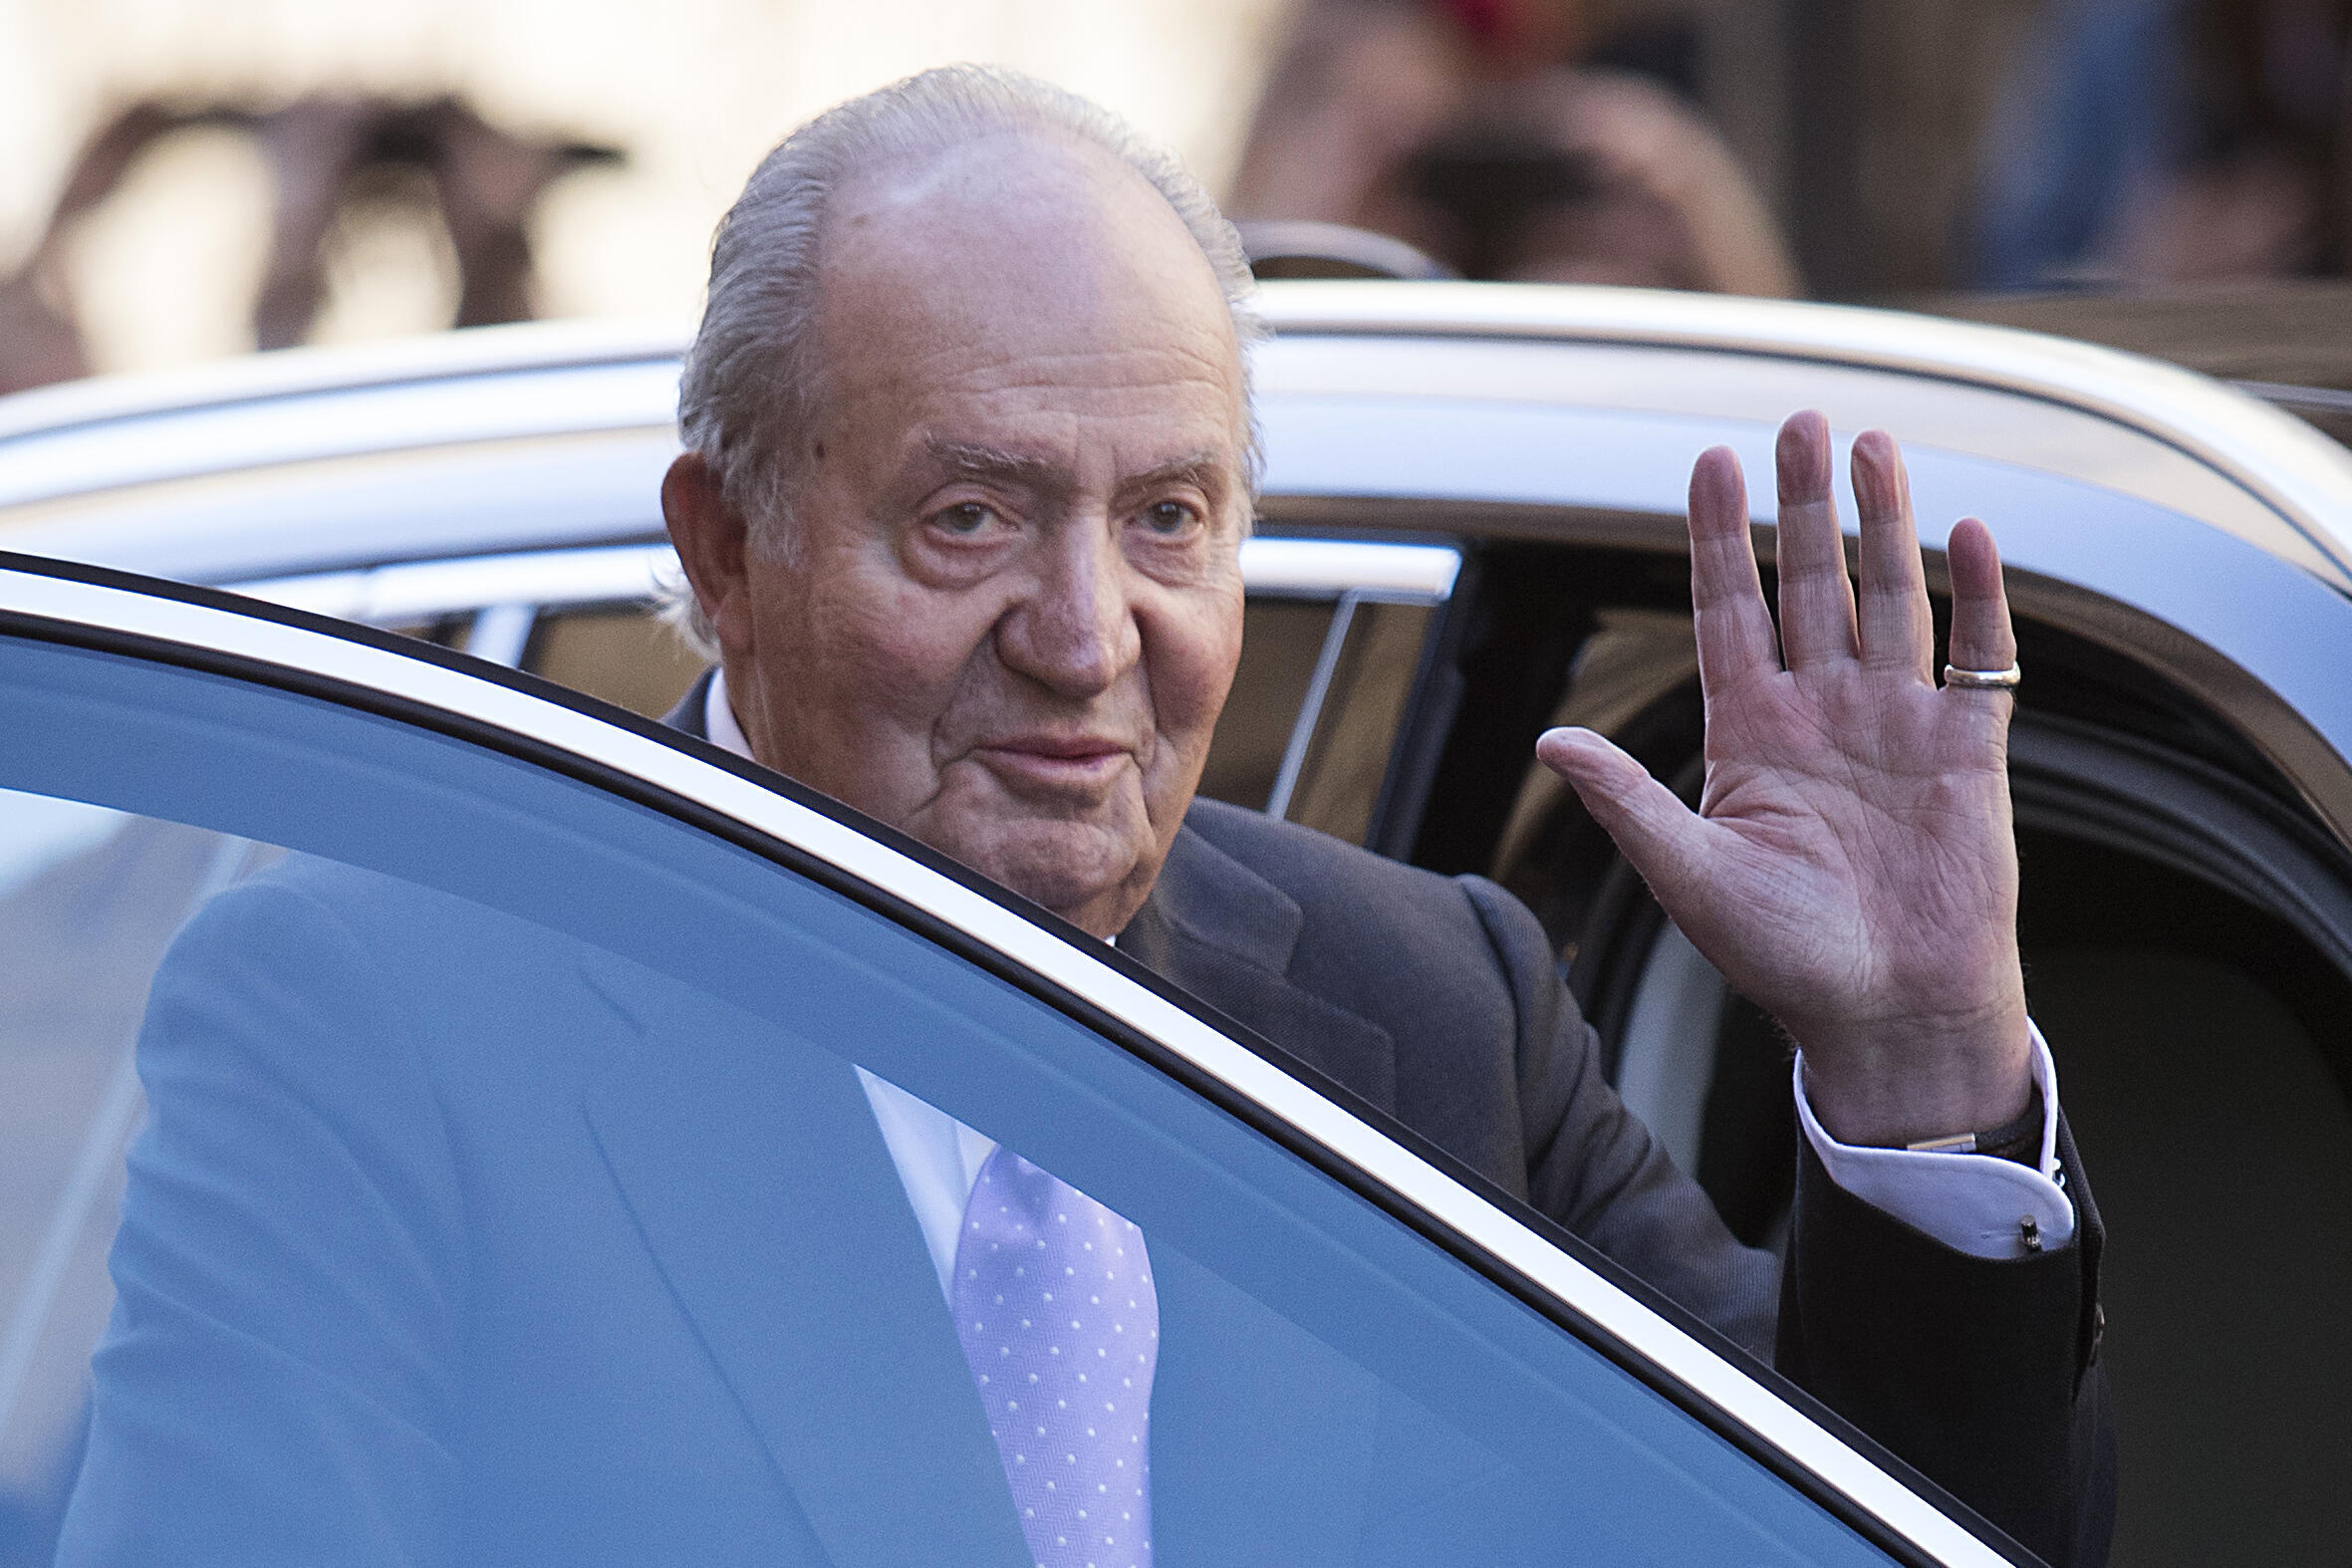 Spain's former king Juan Carlos abdicated in 2014